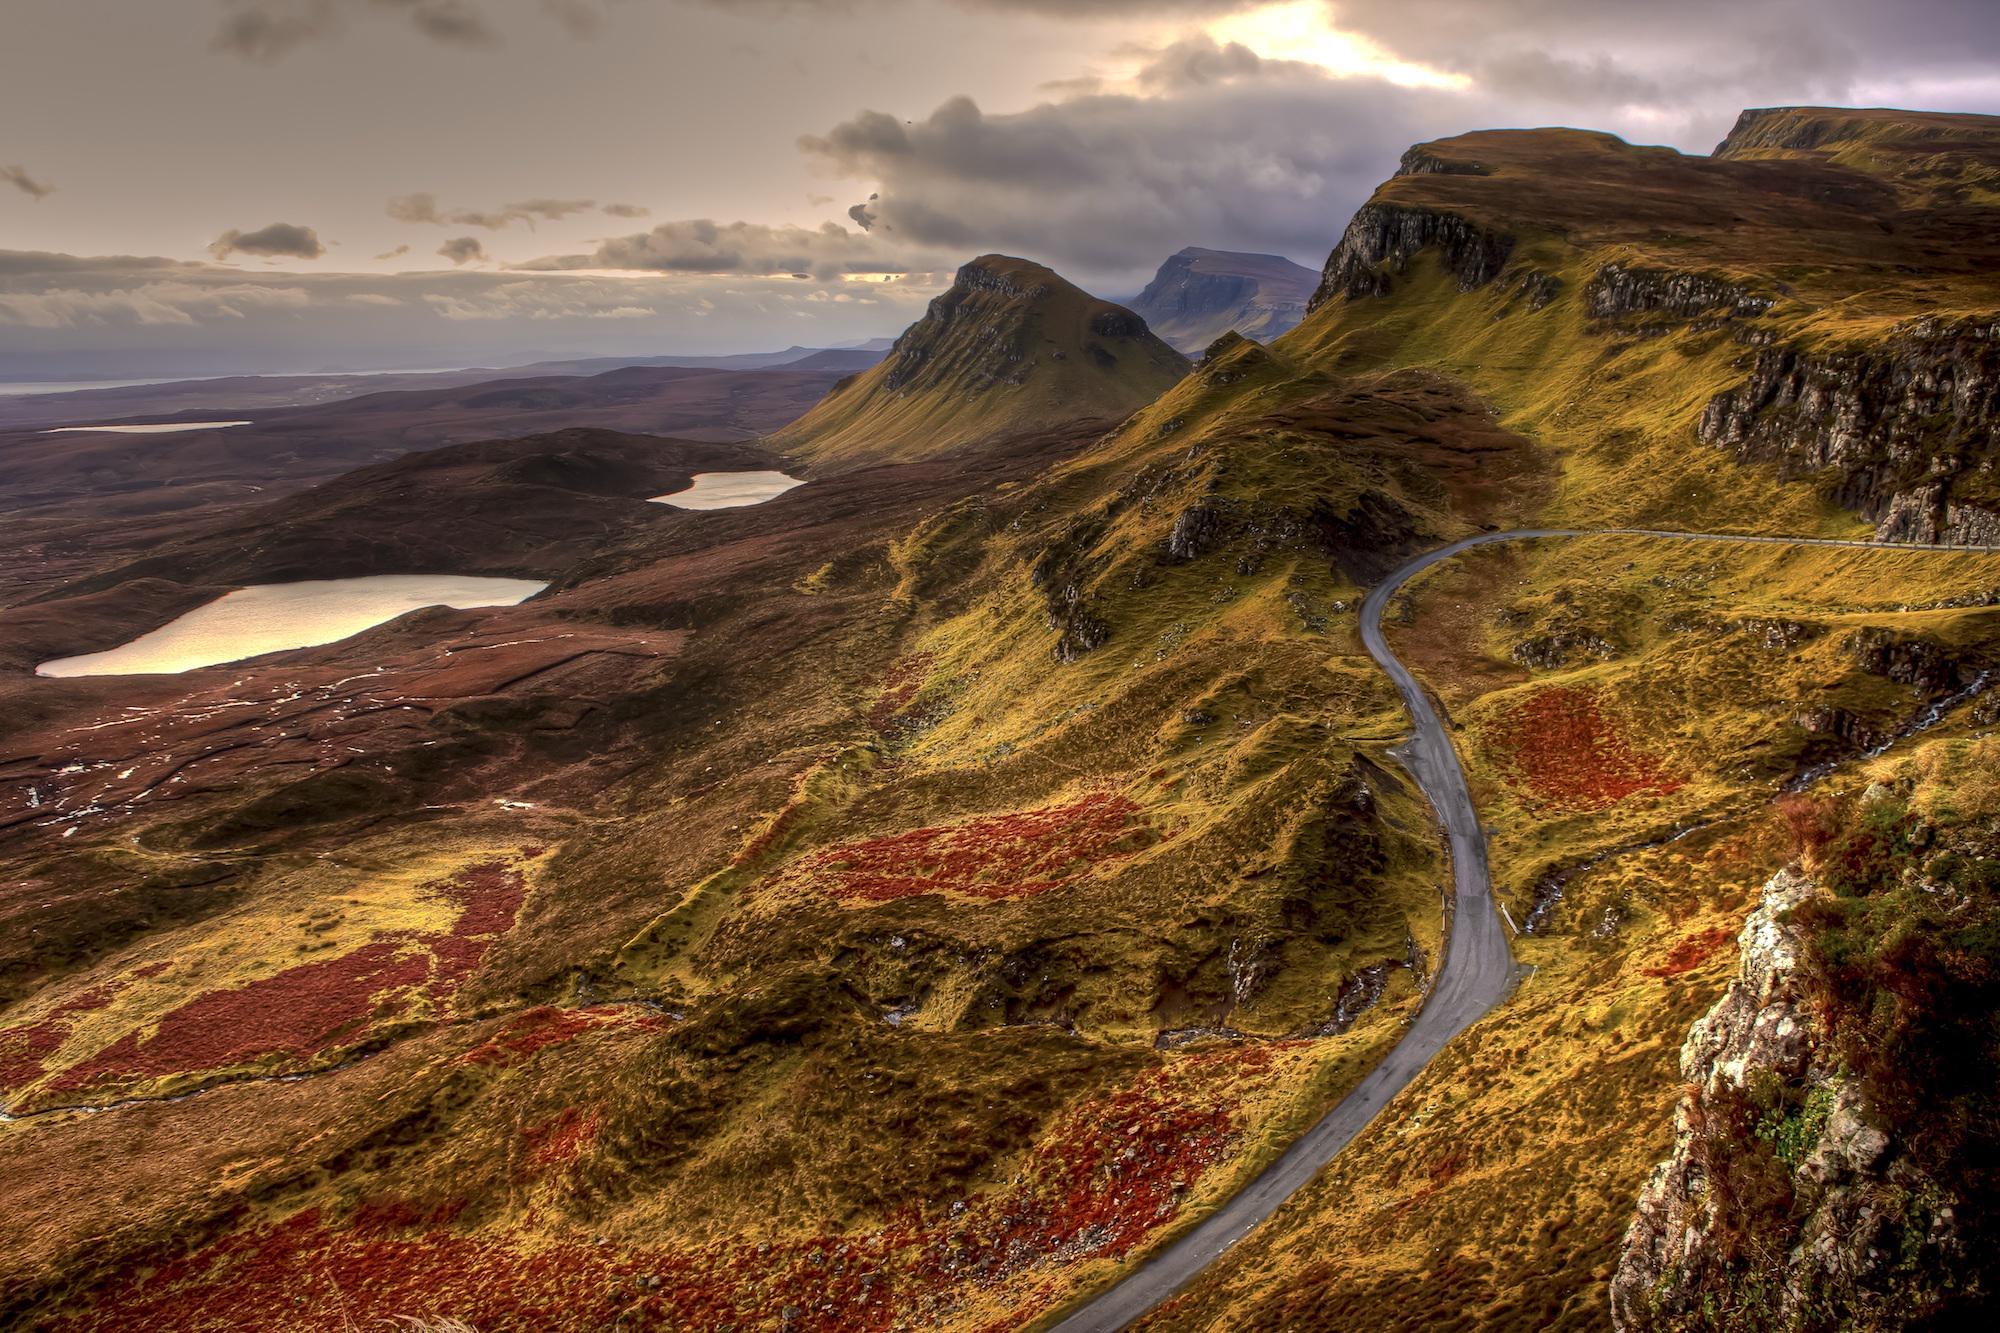 Campervan Hire in Scotland | Campervan Rental Companies in Scotland